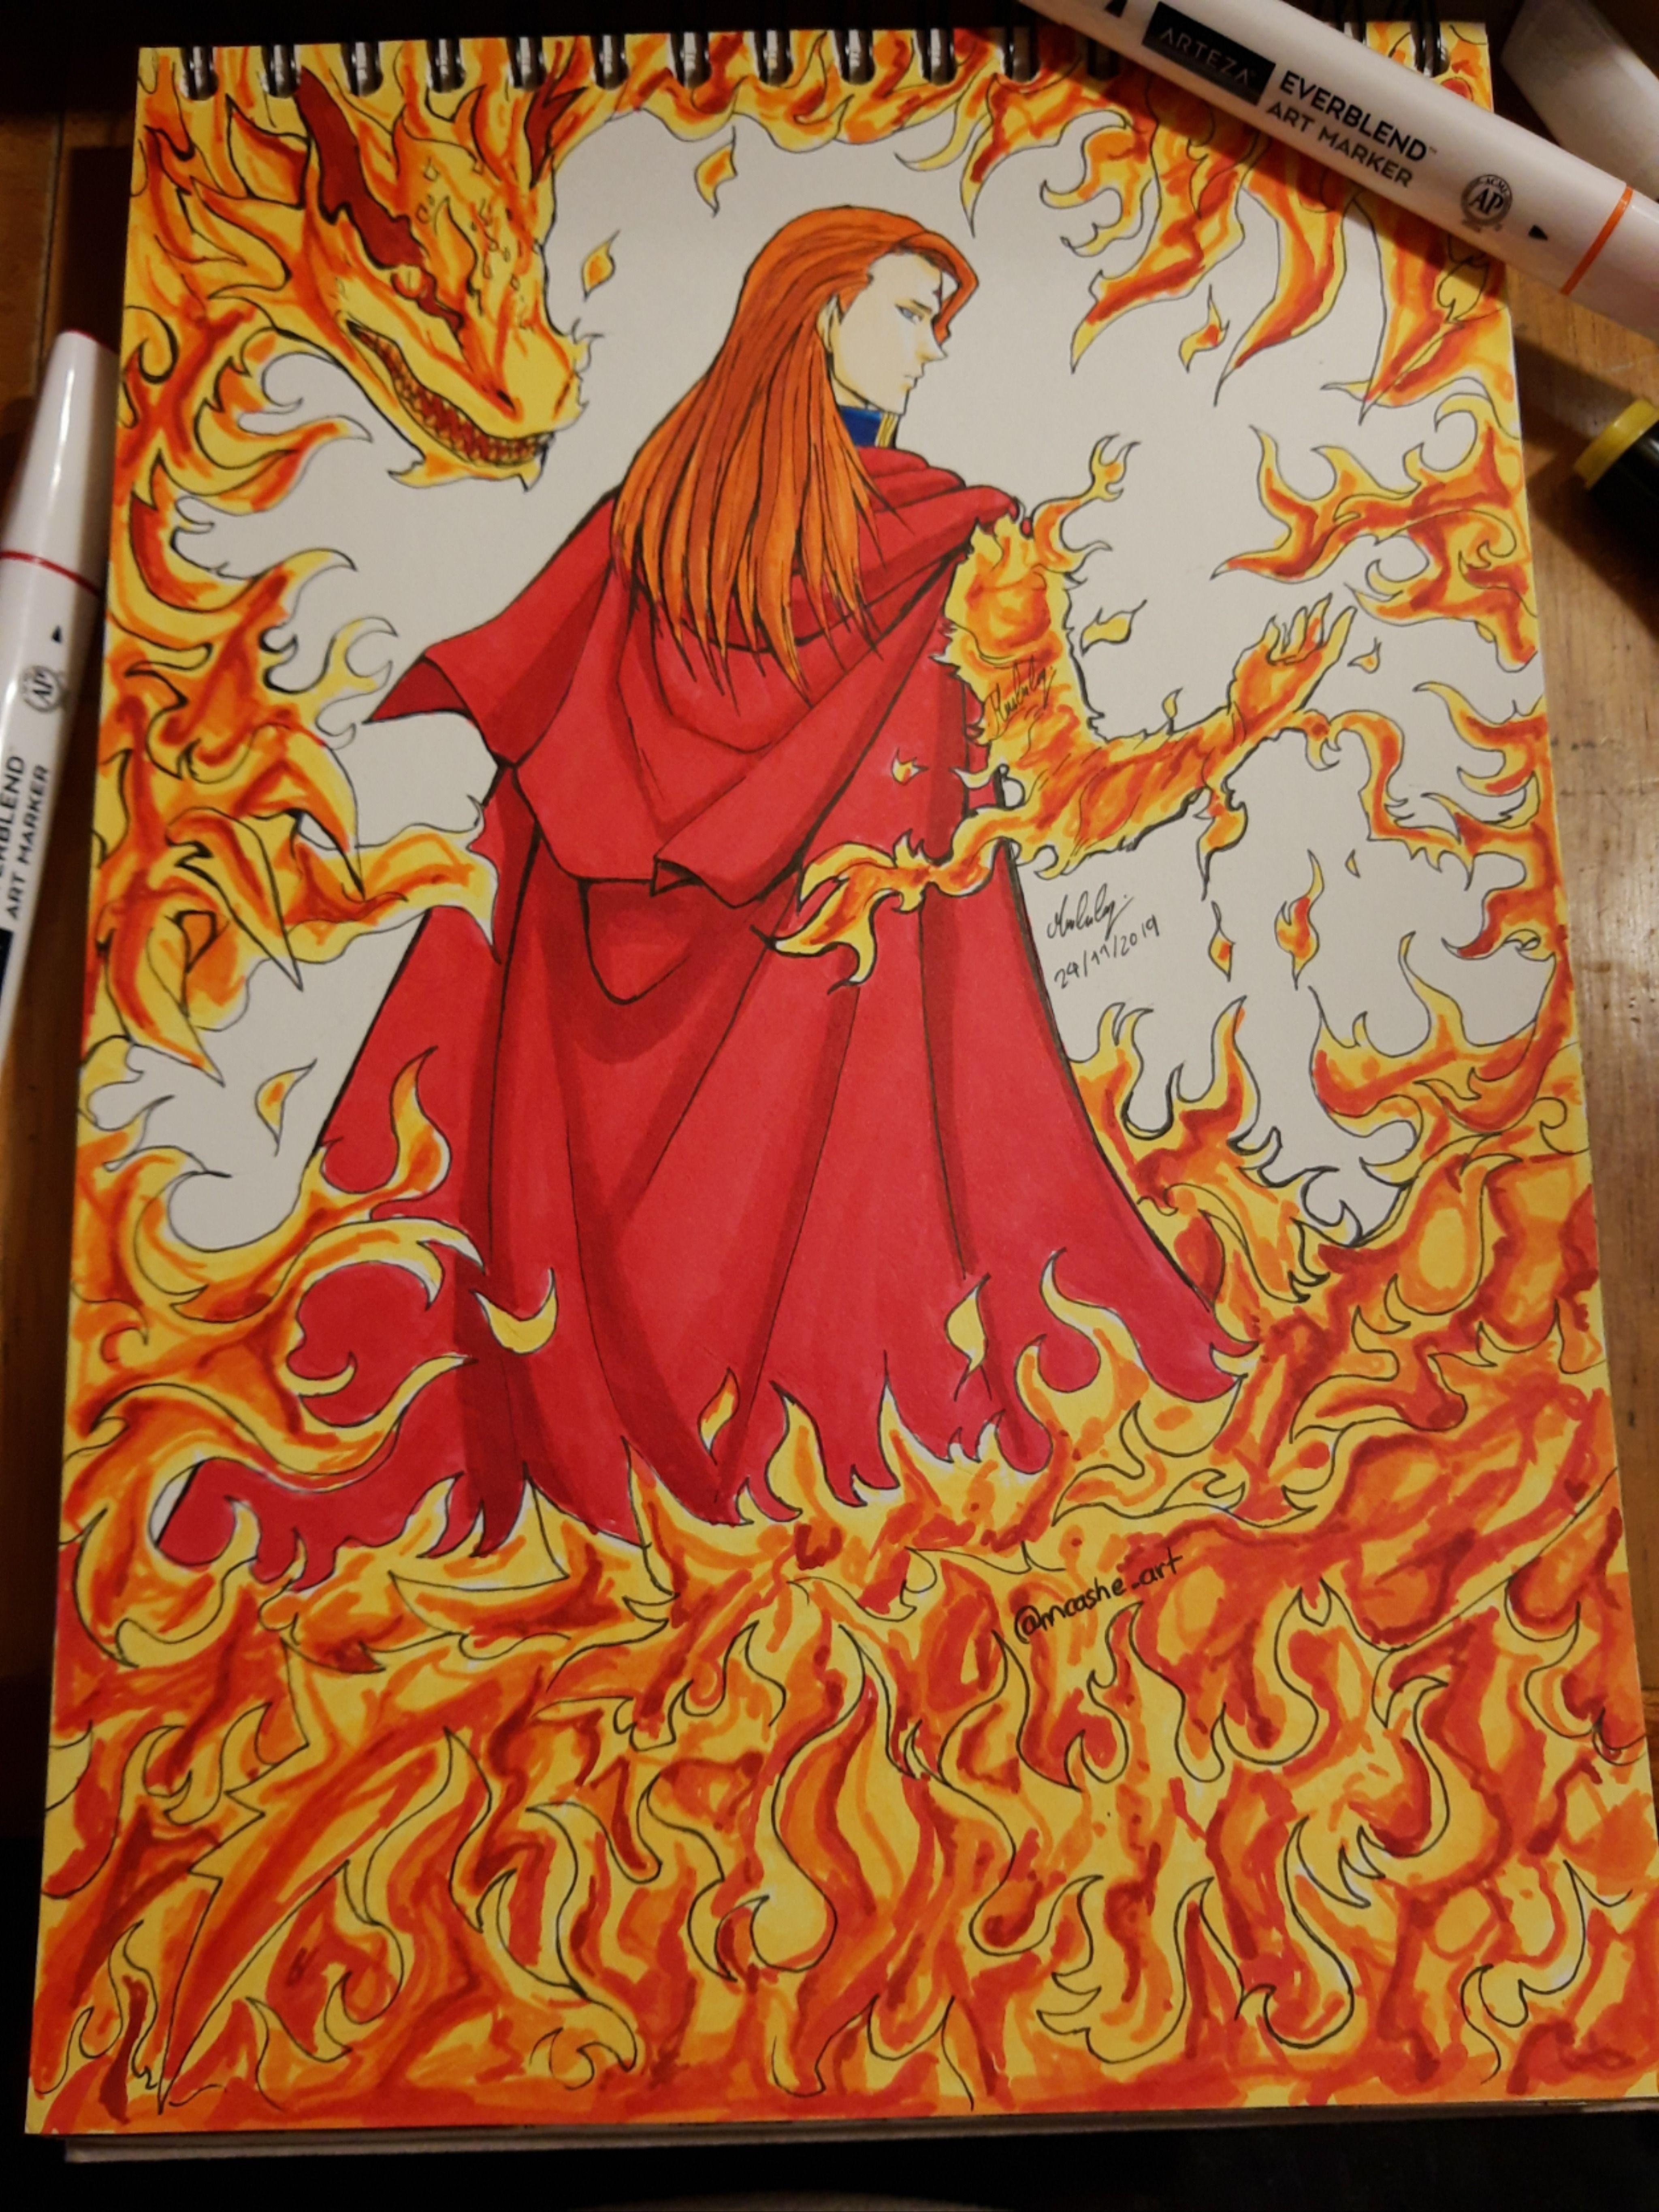 #fuegoleonvermillion #fuegoleon #fuegoleonvermilion #blackclover #   Displate thumbnail